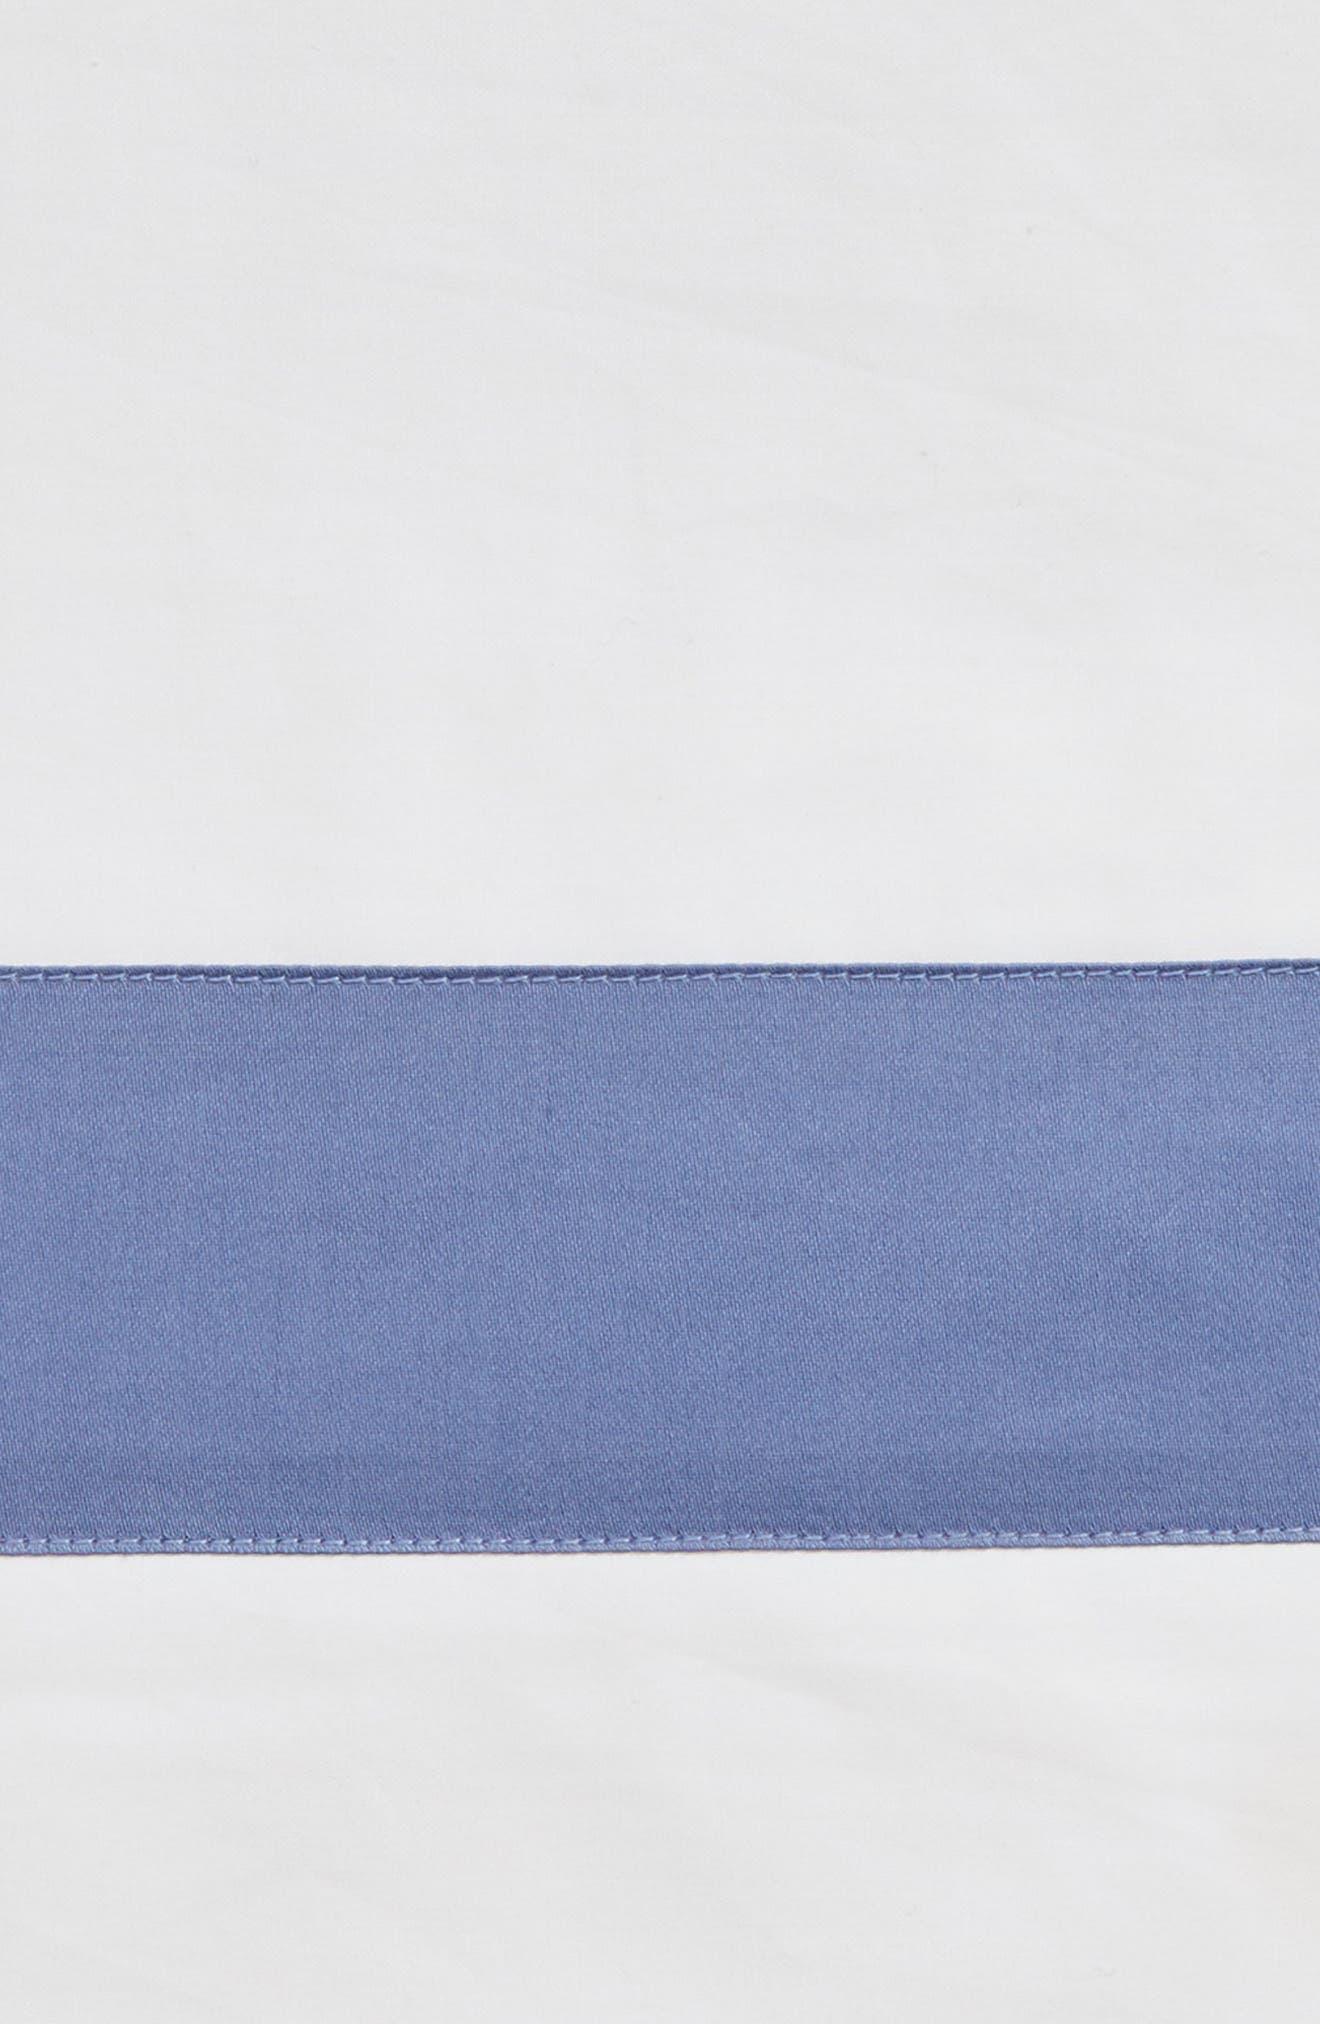 Orlo Flat Sheet,                             Alternate thumbnail 2, color,                             White/ Cornflower